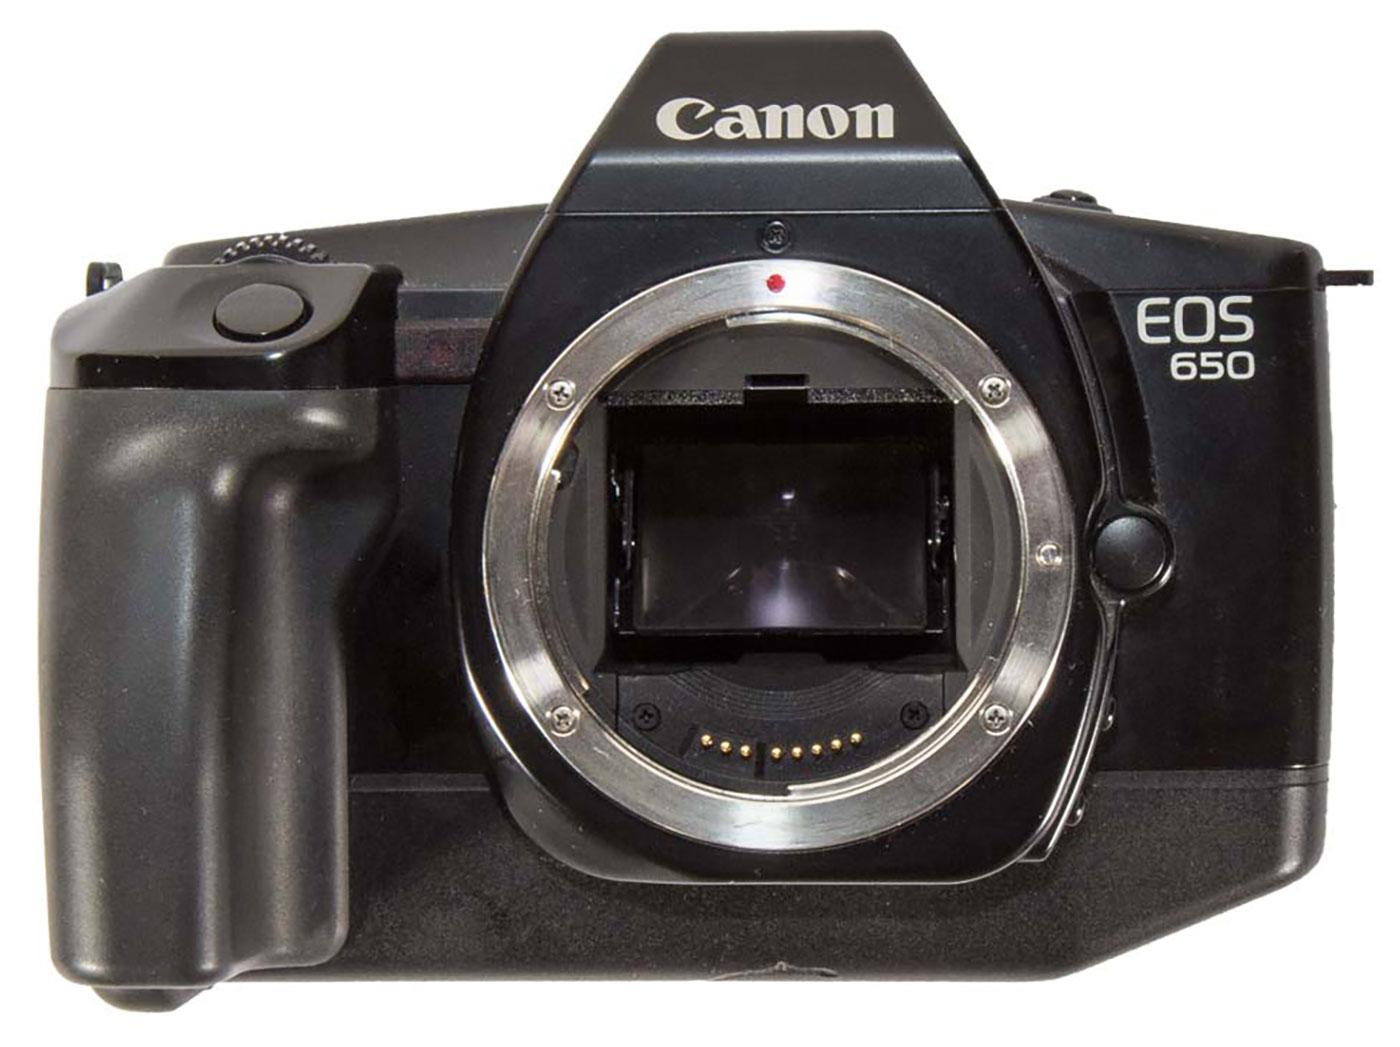 Canon EOS 650 Camera